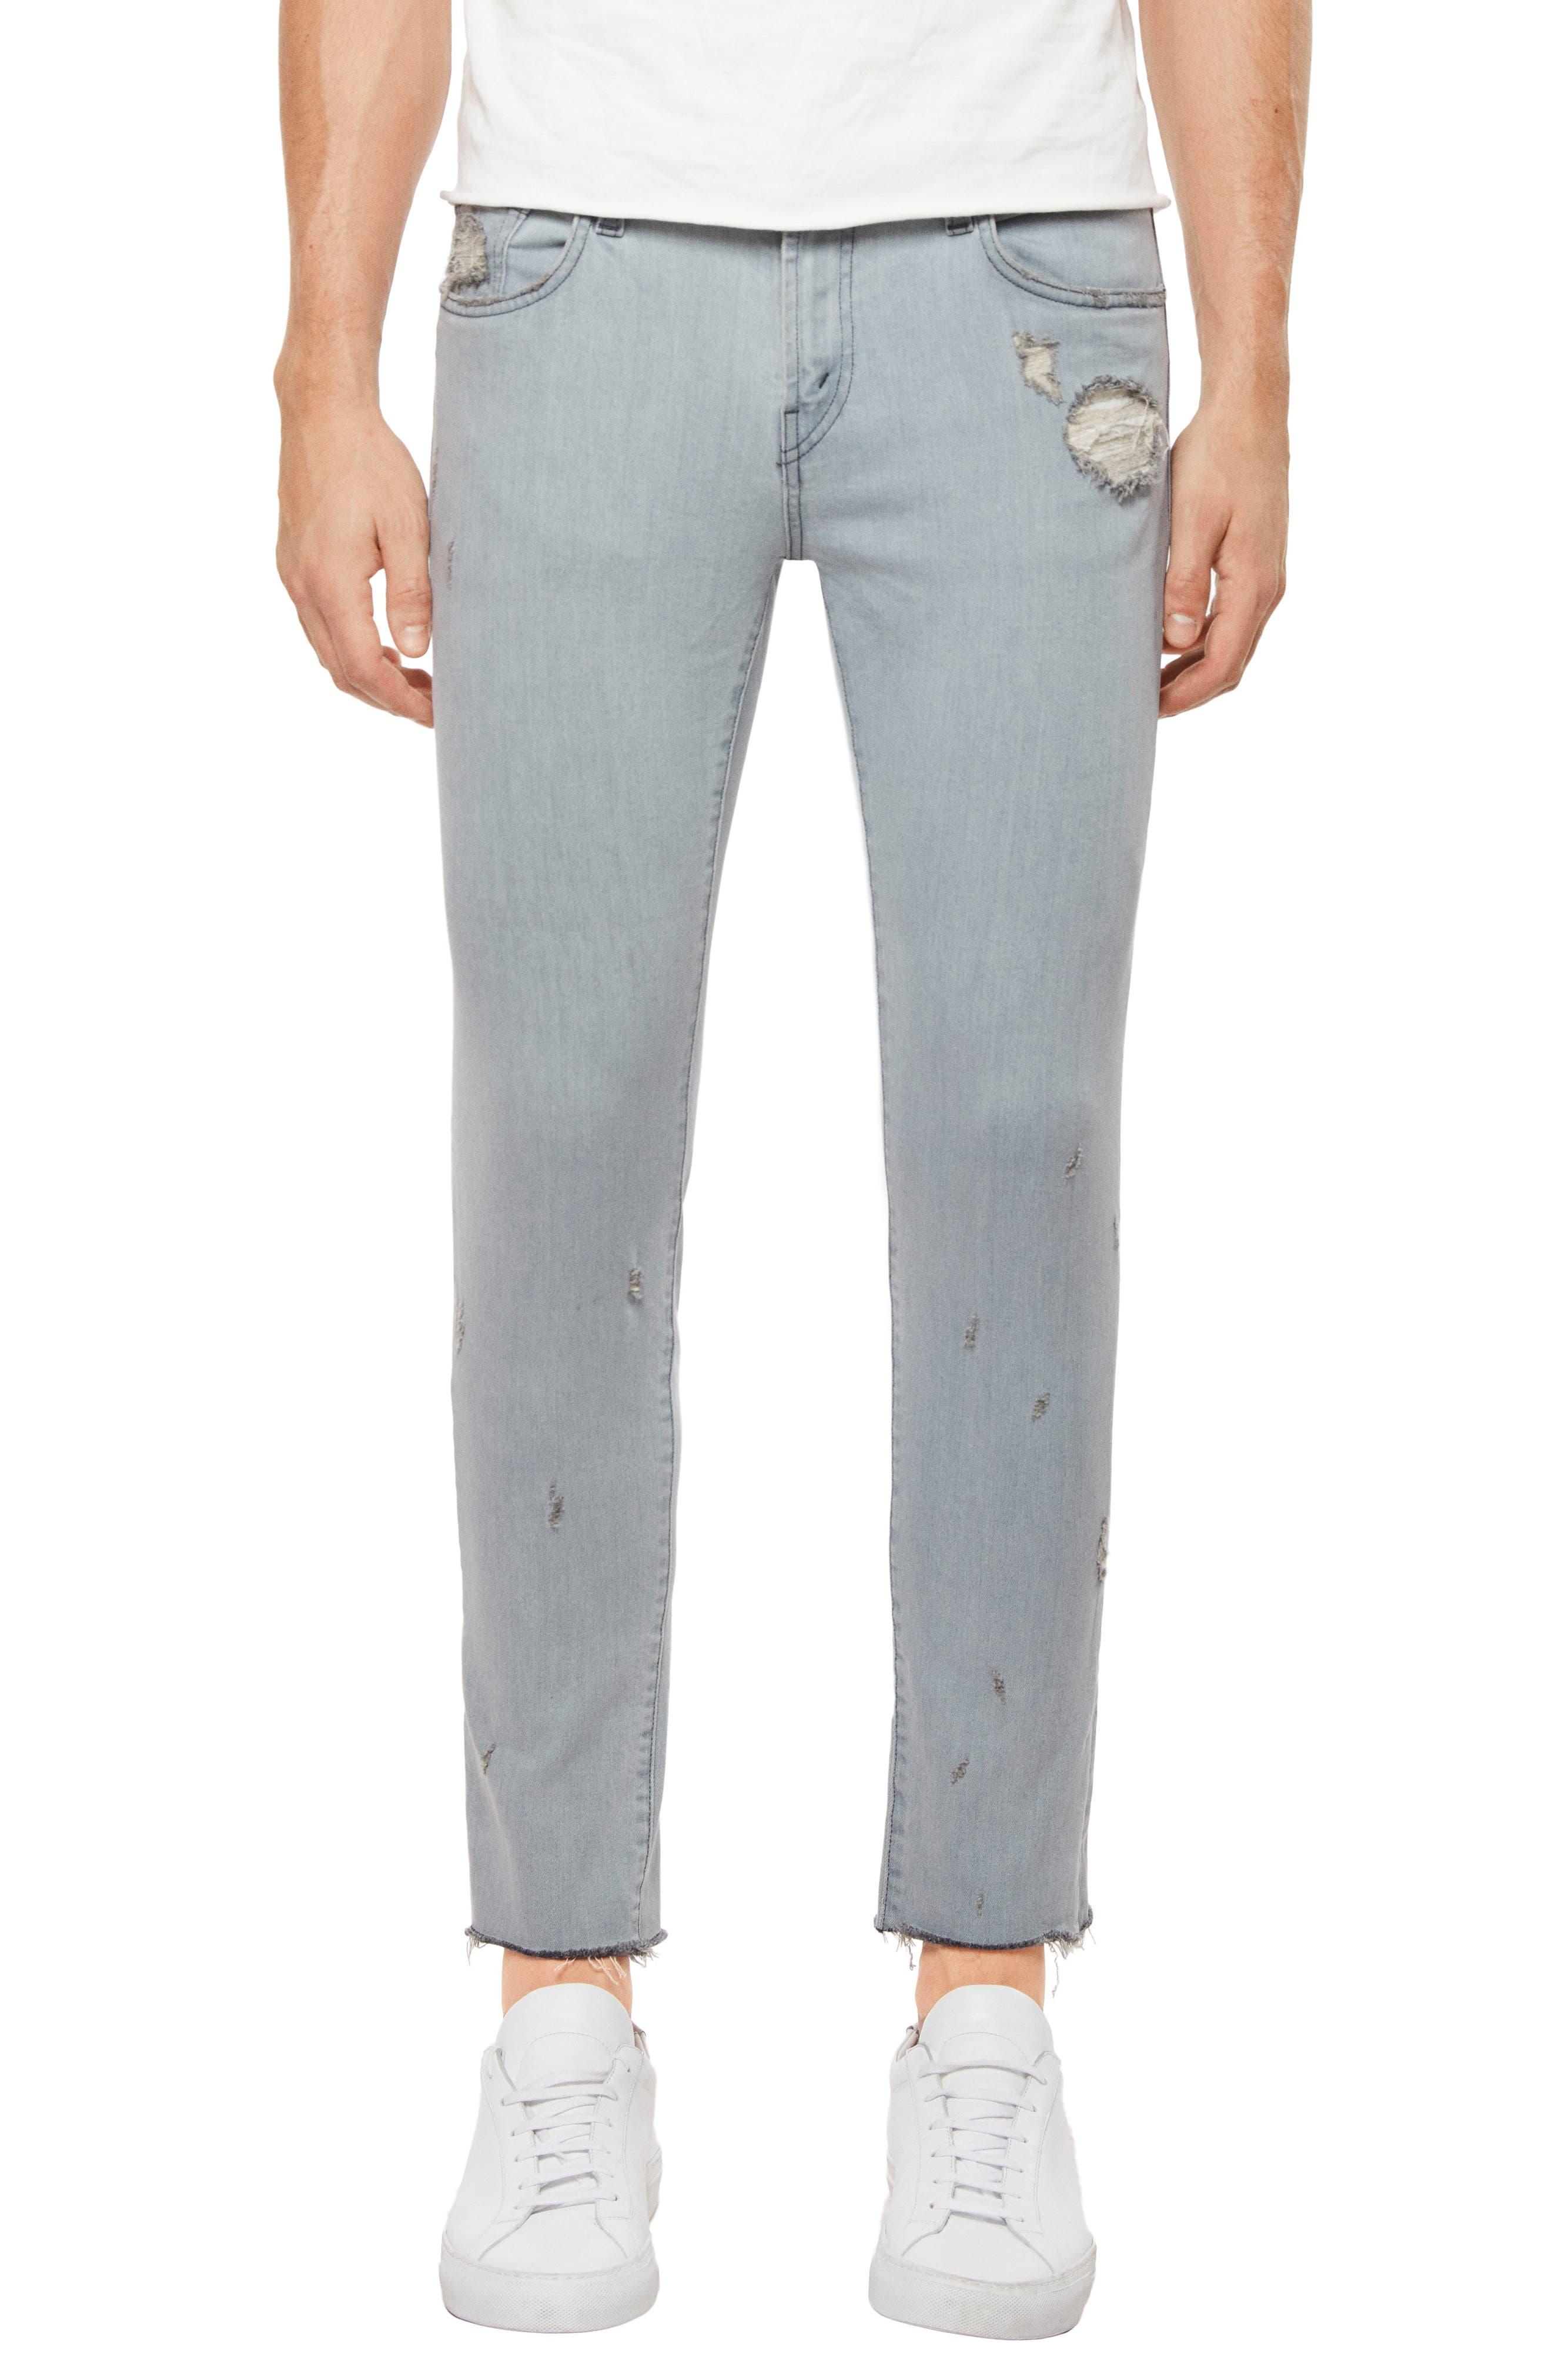 Tyler Slim Fit Jeans,                             Main thumbnail 1, color,                             Trounced Porpoise